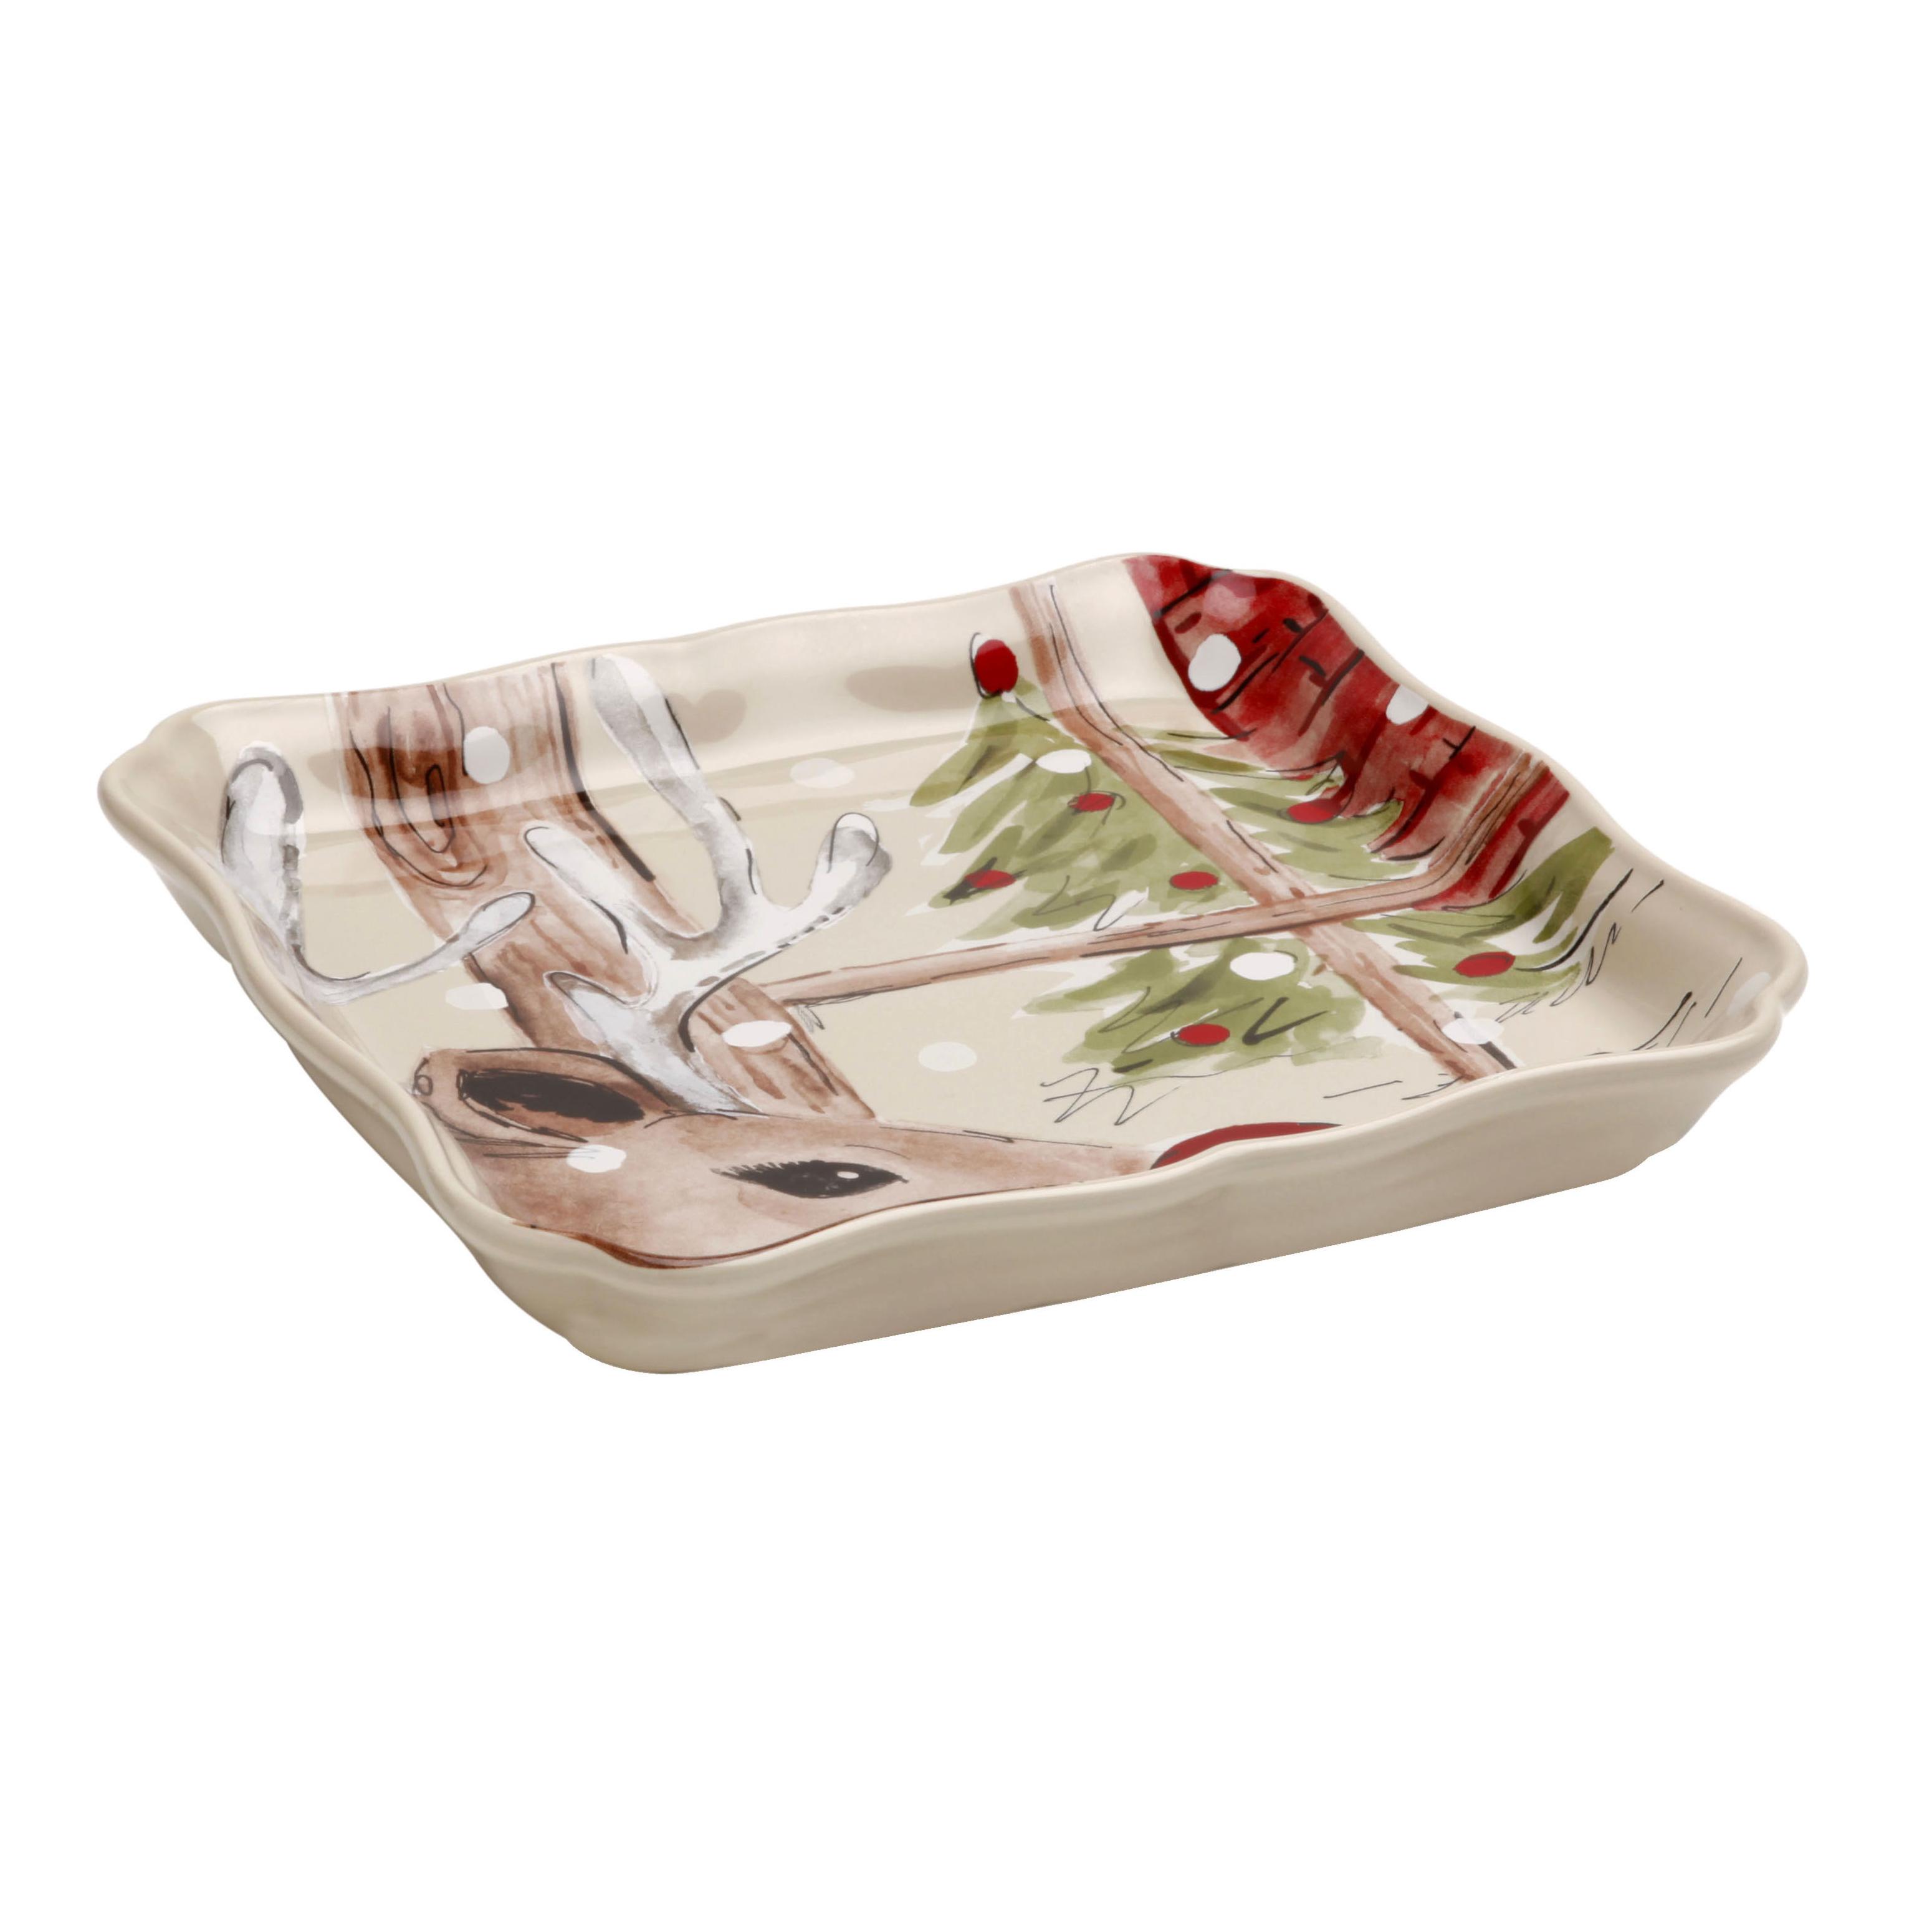 Casafina Deer Friends Linen Stoneware 8.25 Inch Square Tray